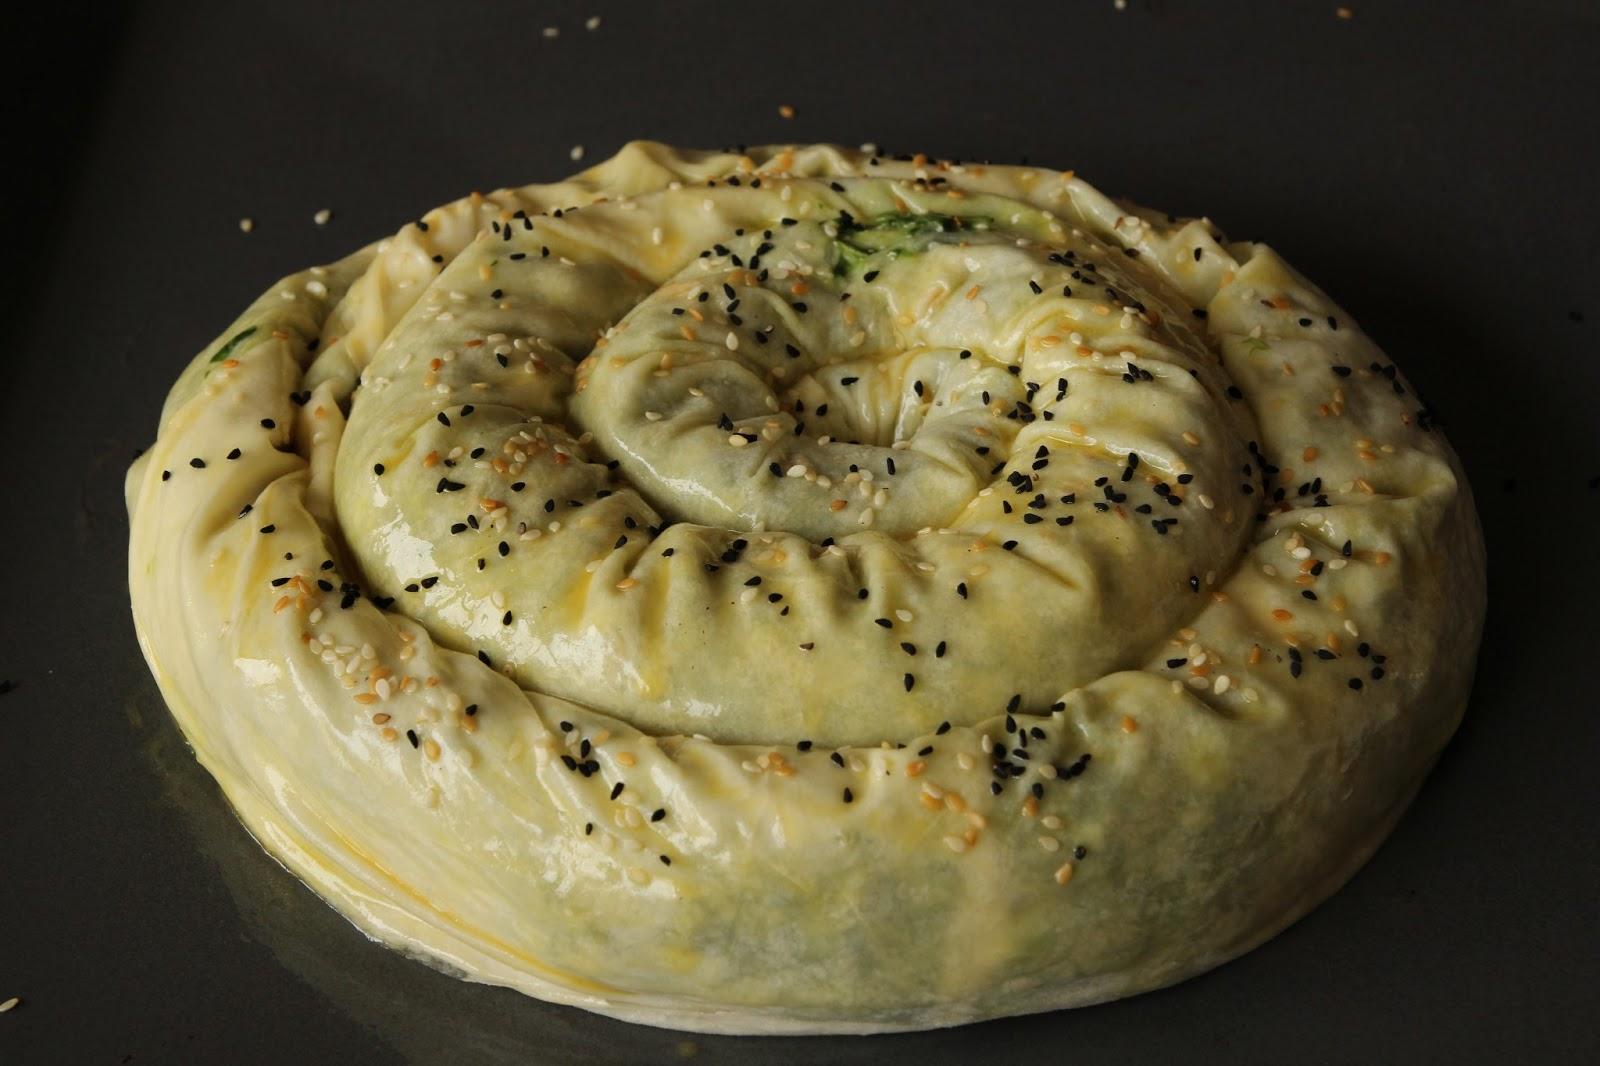 İspanaklı Peynirli Böreği - Spinach and Cheese Pastry Roll